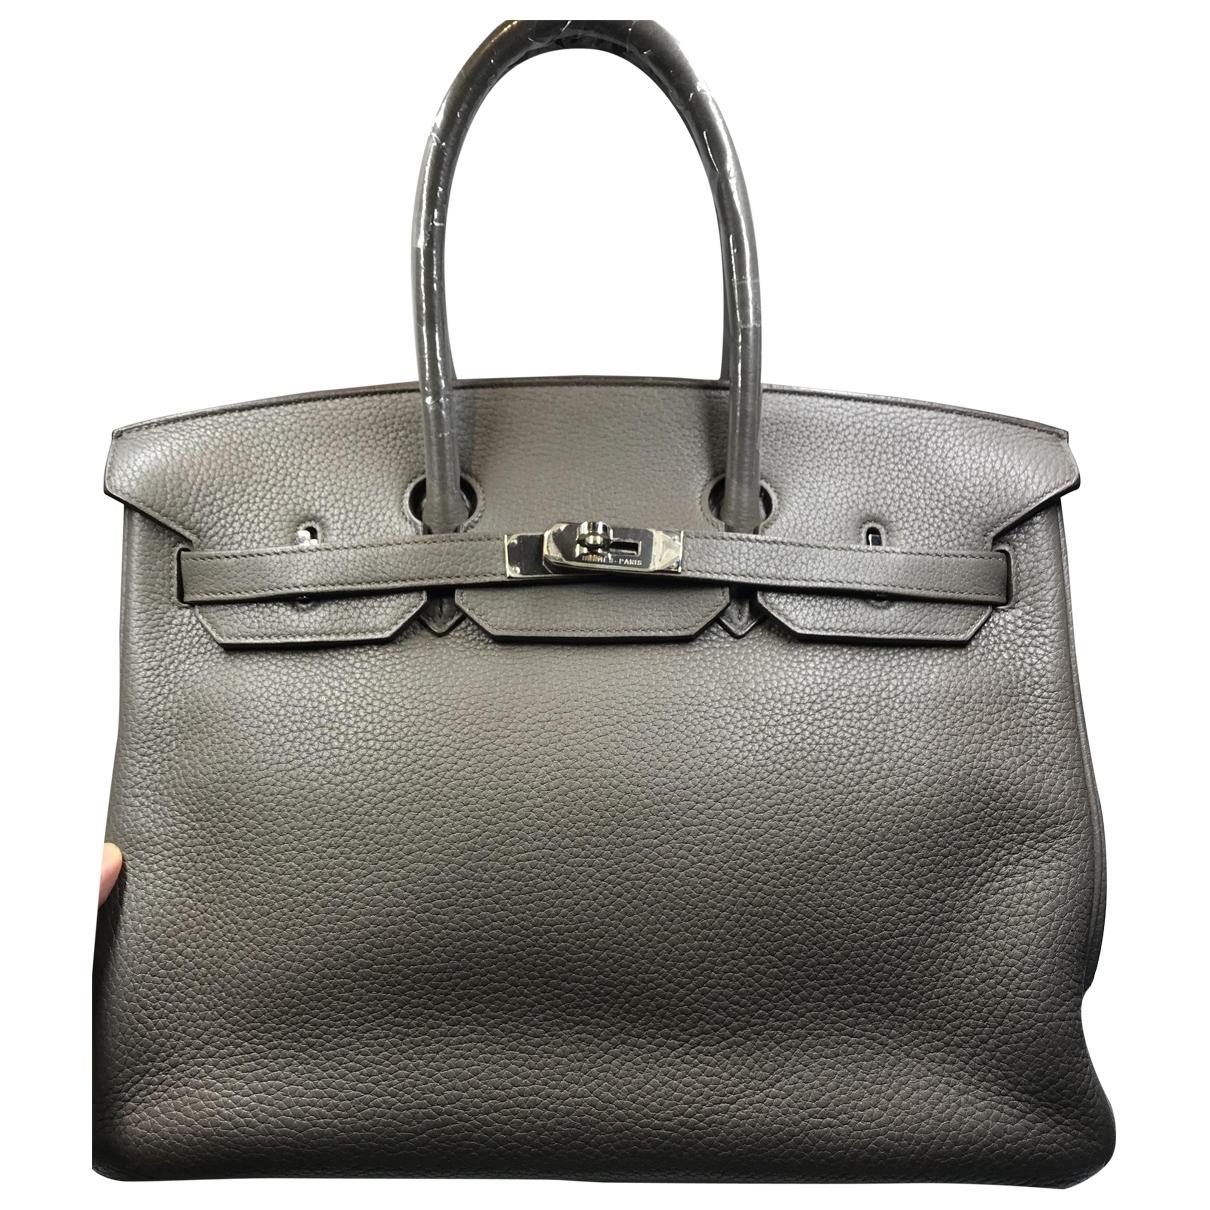 Hermes - Sac a main Birkin 35 pour femme en cuir - gris